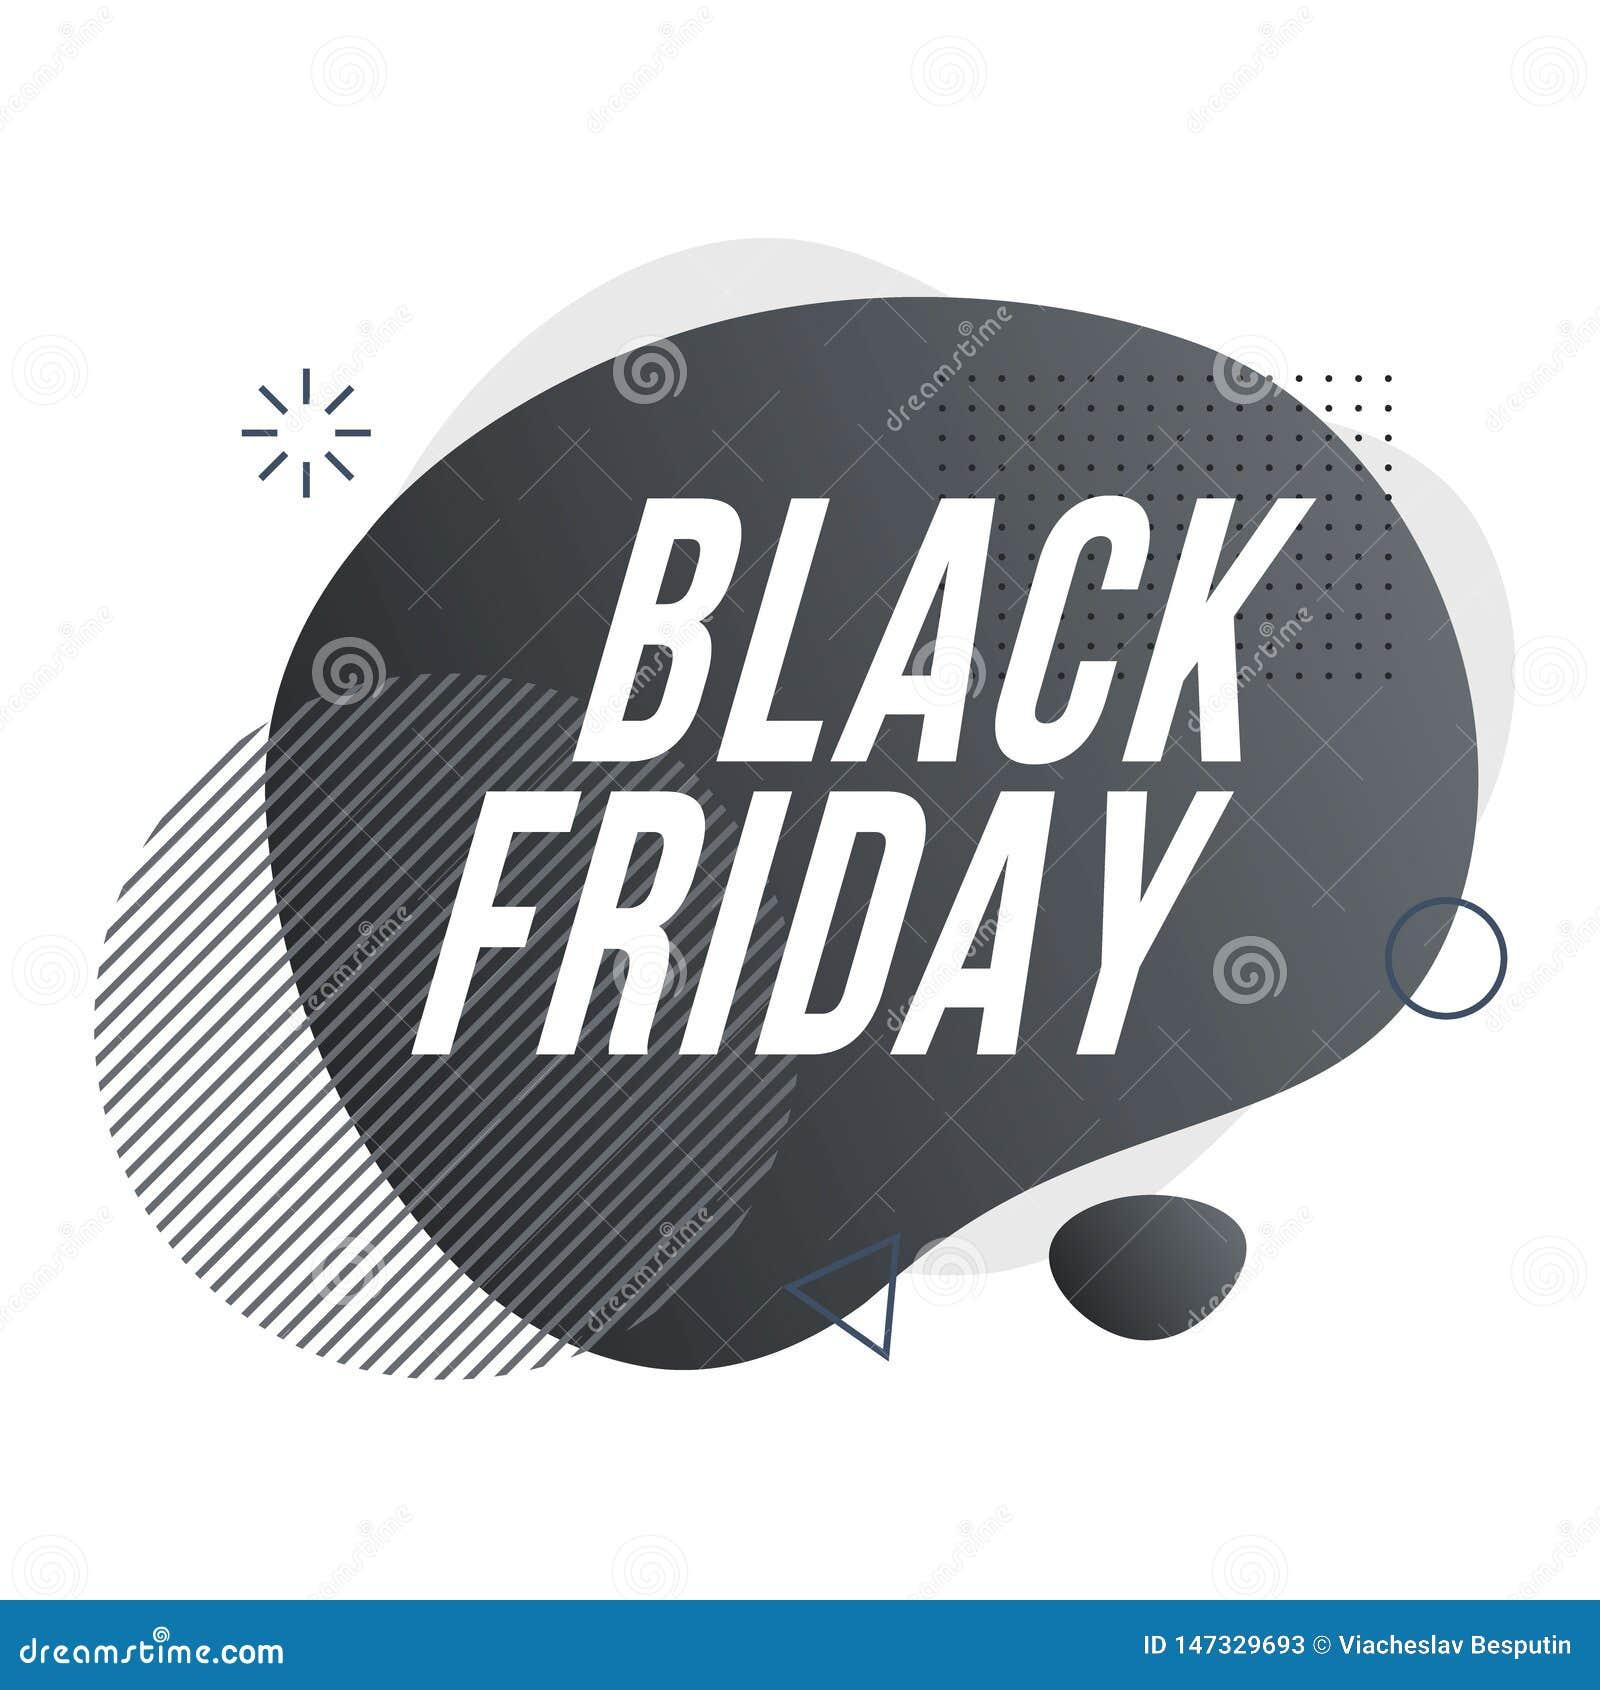 Black Friday. Organic design